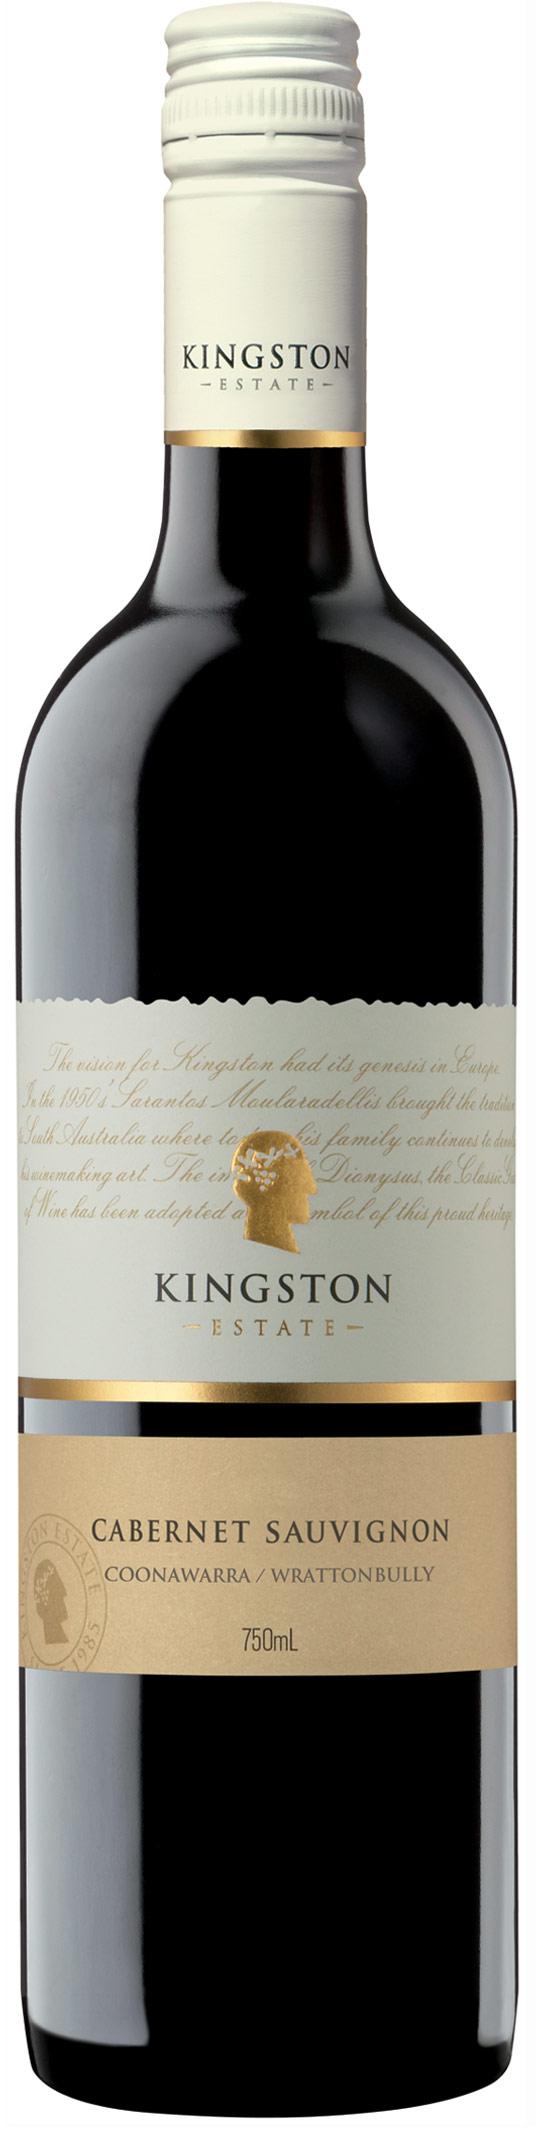 kingston cab